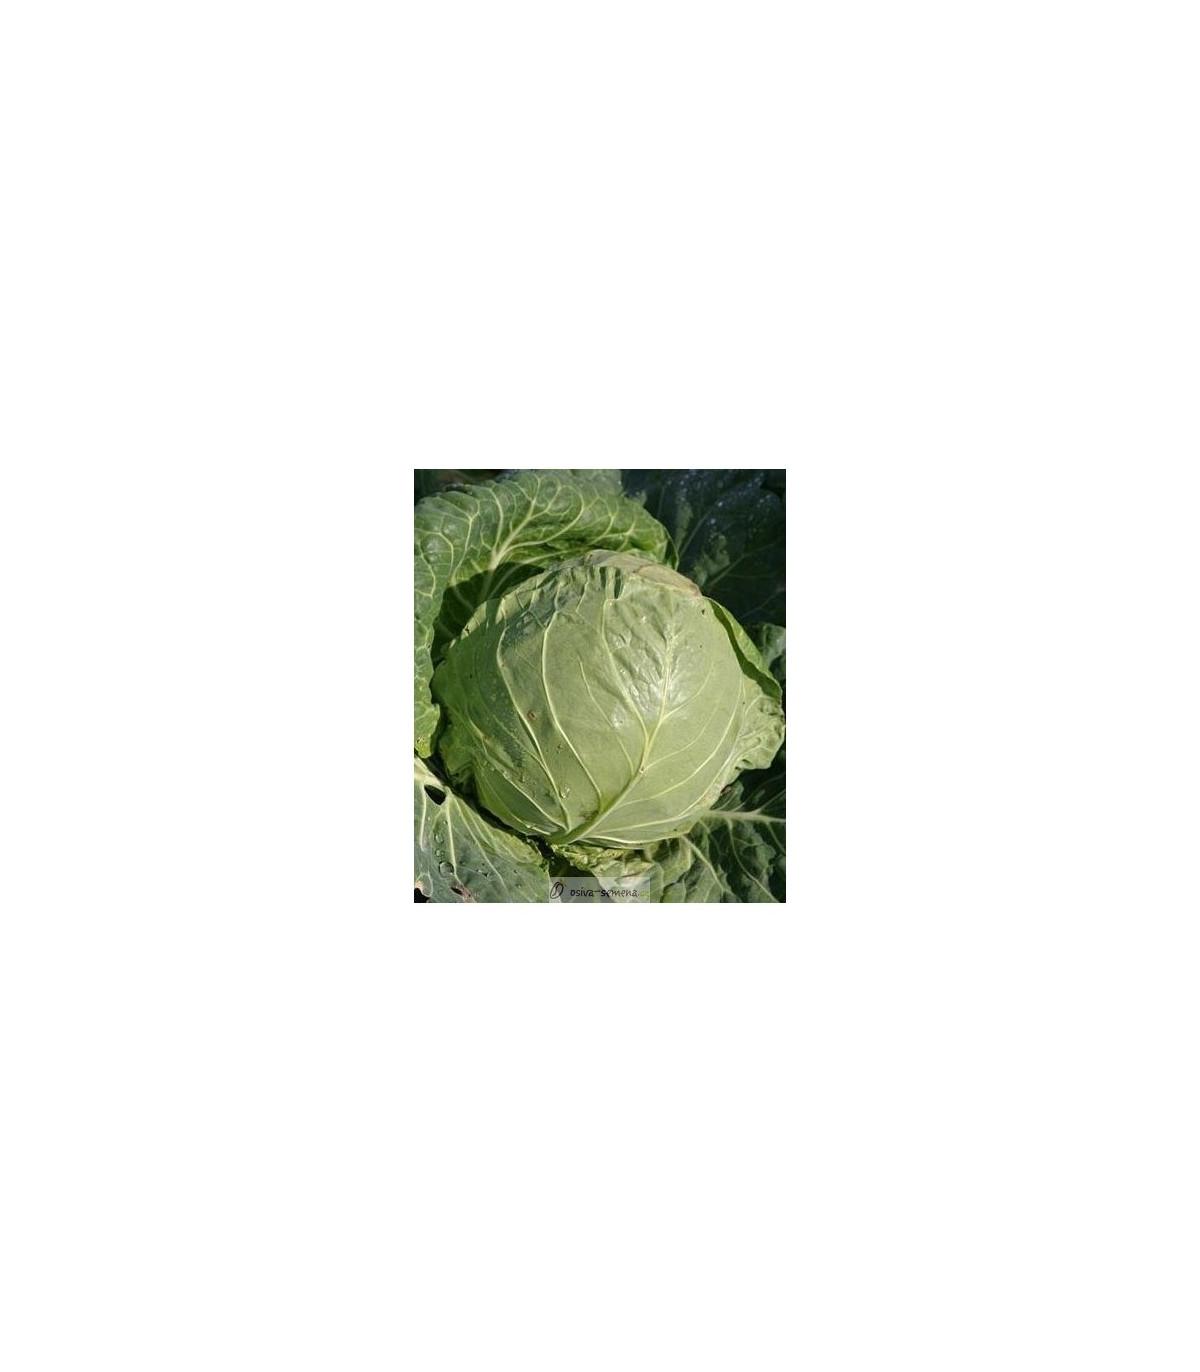 BIO Biela kapusta Premier - Brassica oleracea - semená kapusty - semiačka - 0,3 gr